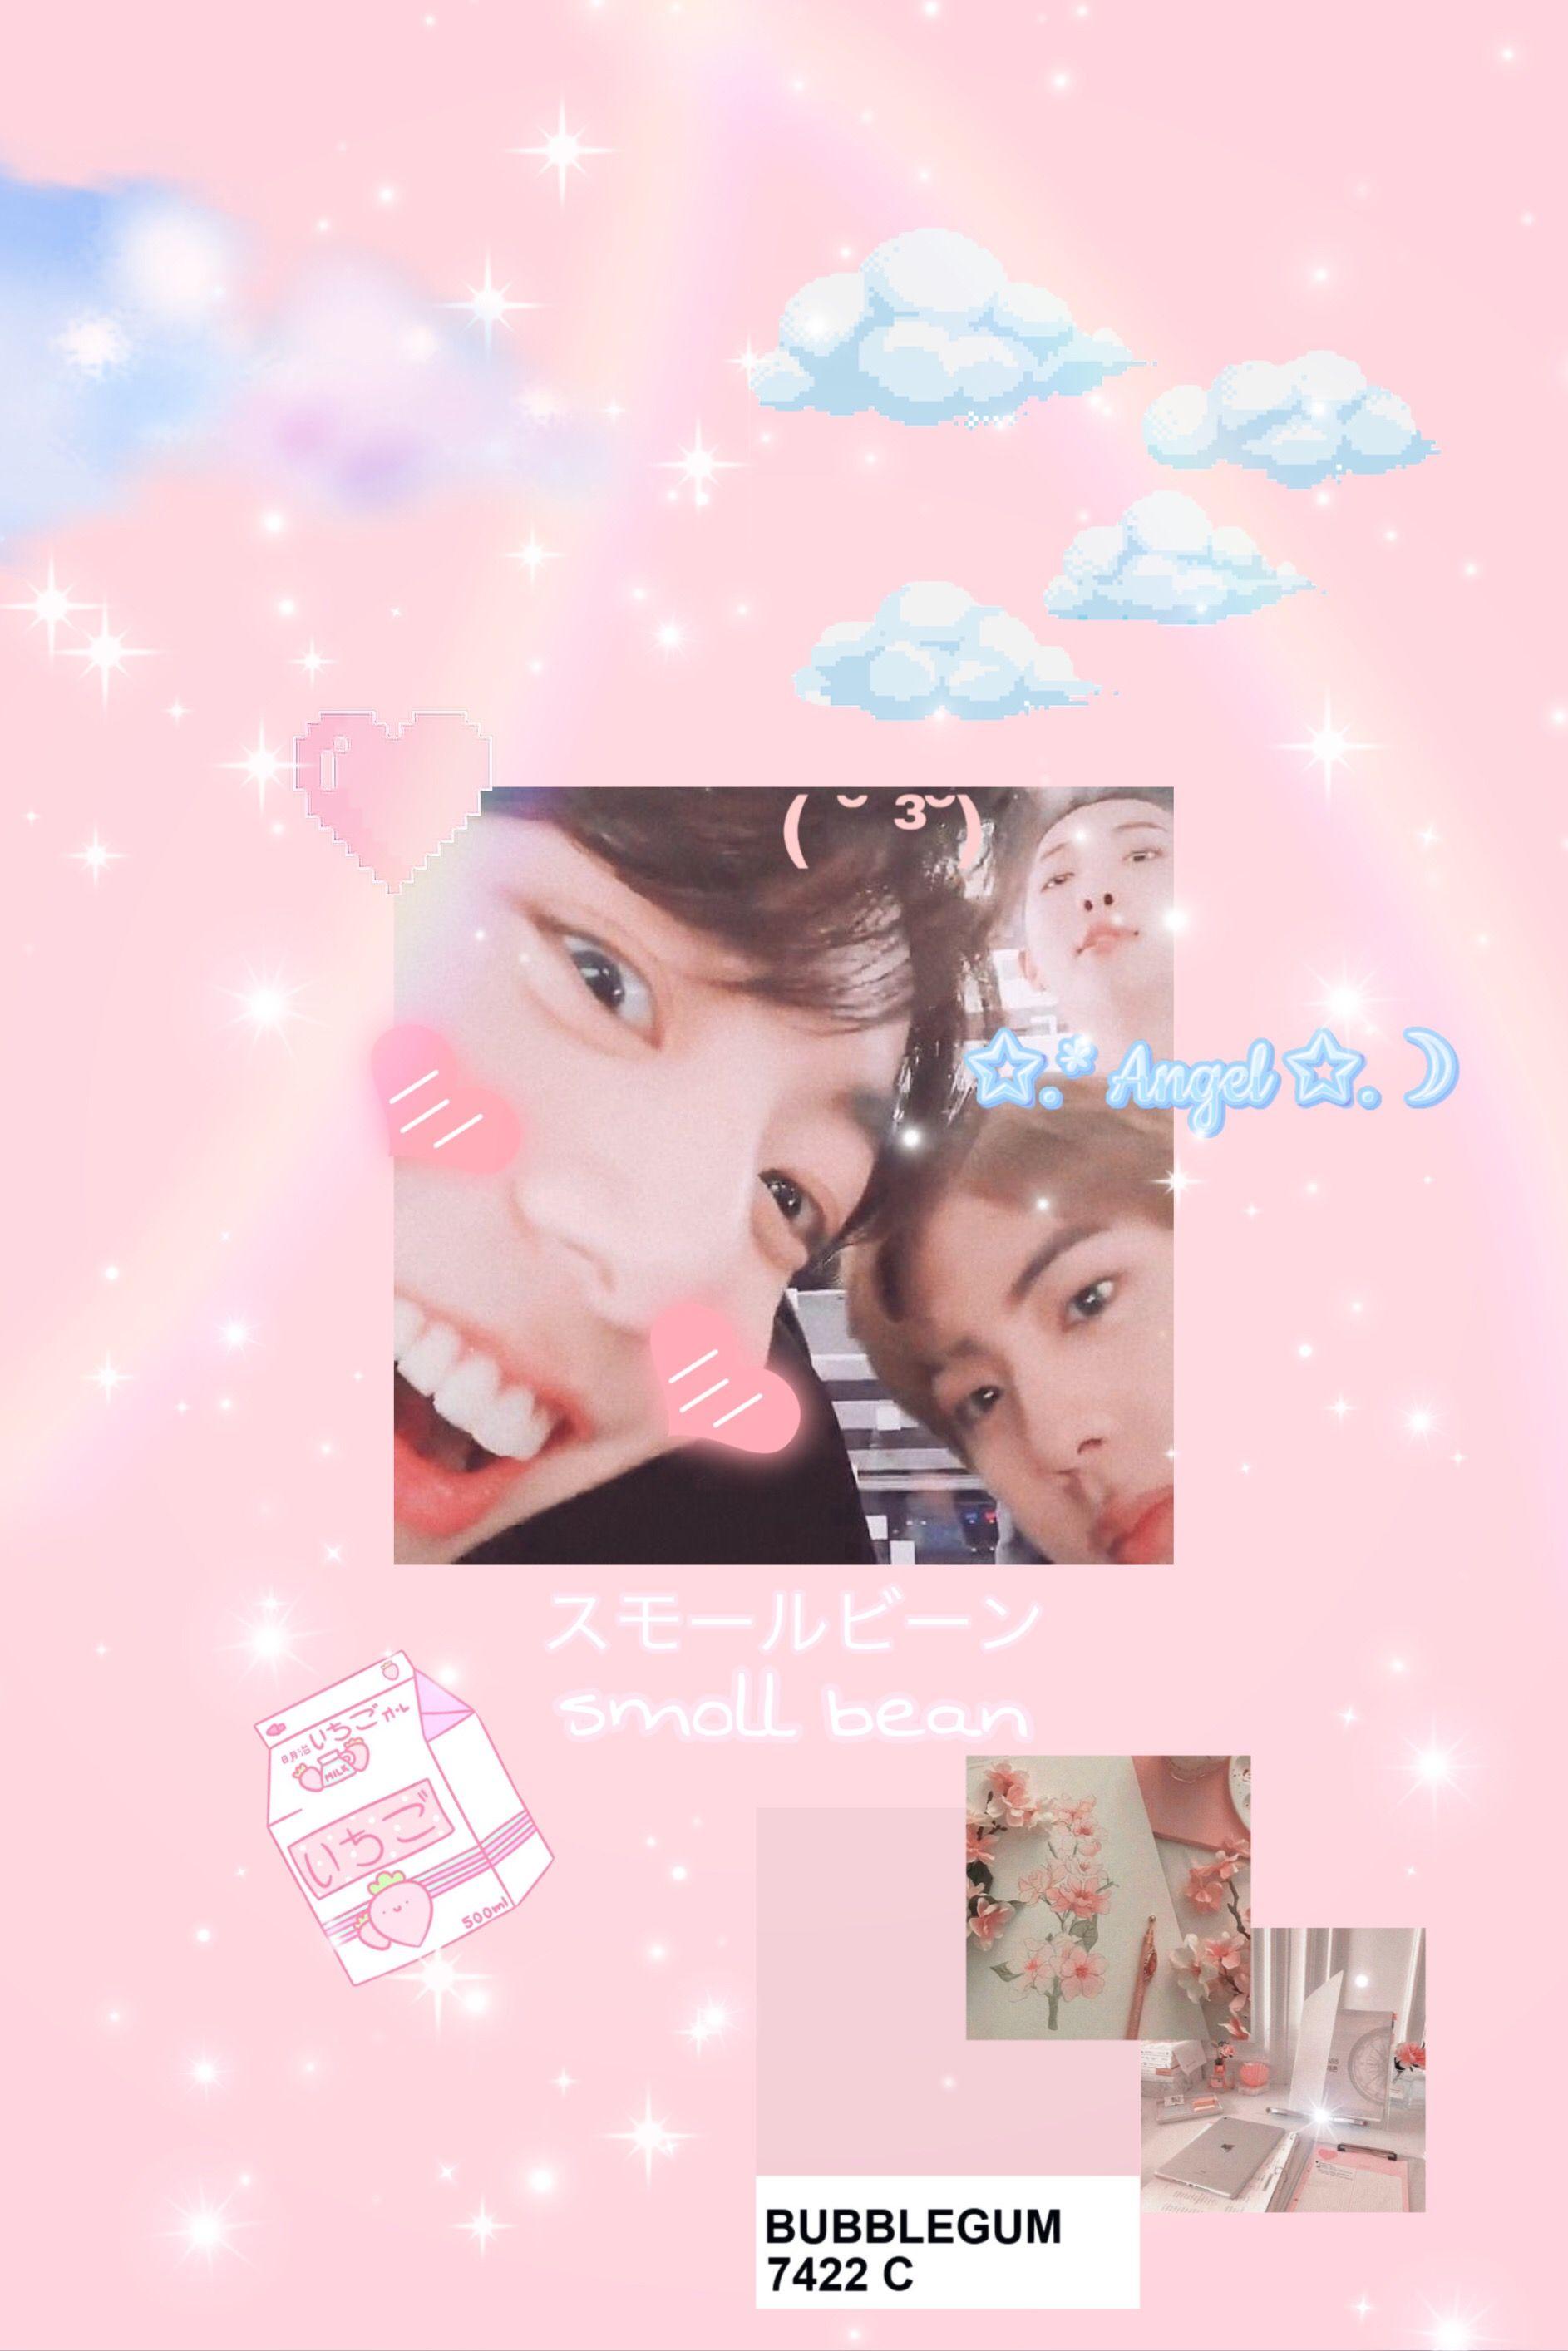 Soft Bangtan Wallpaper Pink Aesthetic Iphone Wallpaper Sky Soft Wallpaper